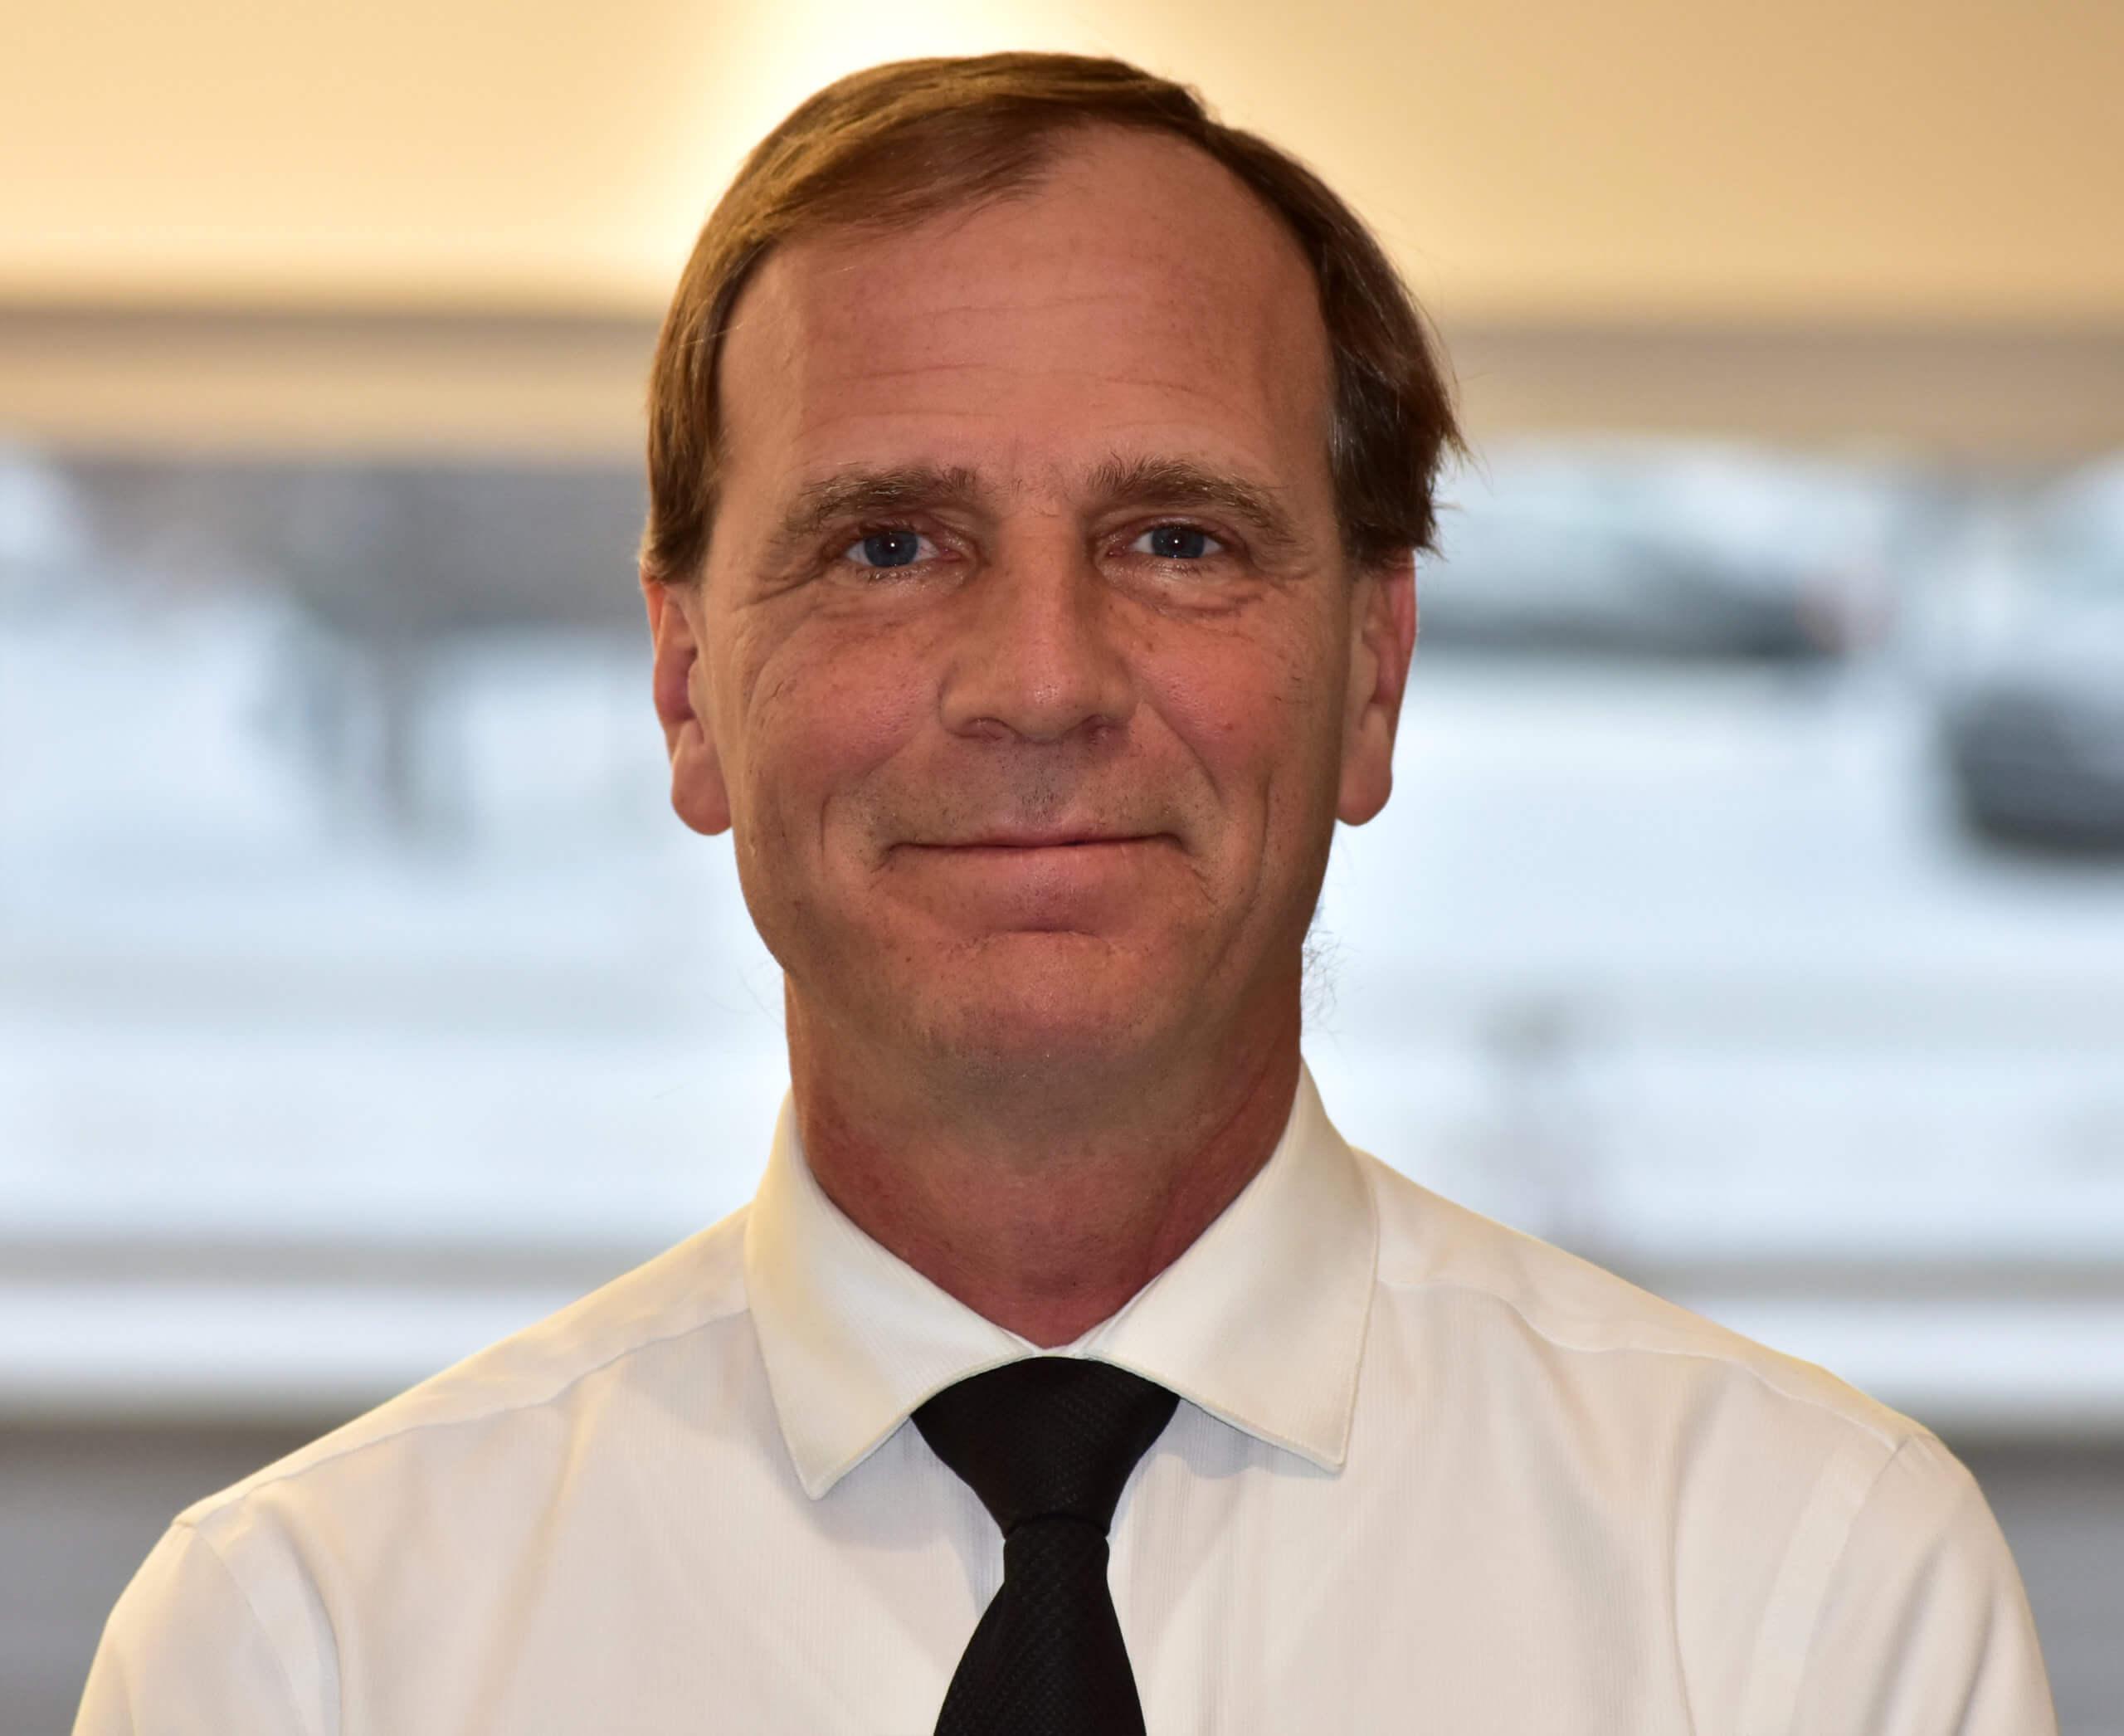 Michael Oldenburger